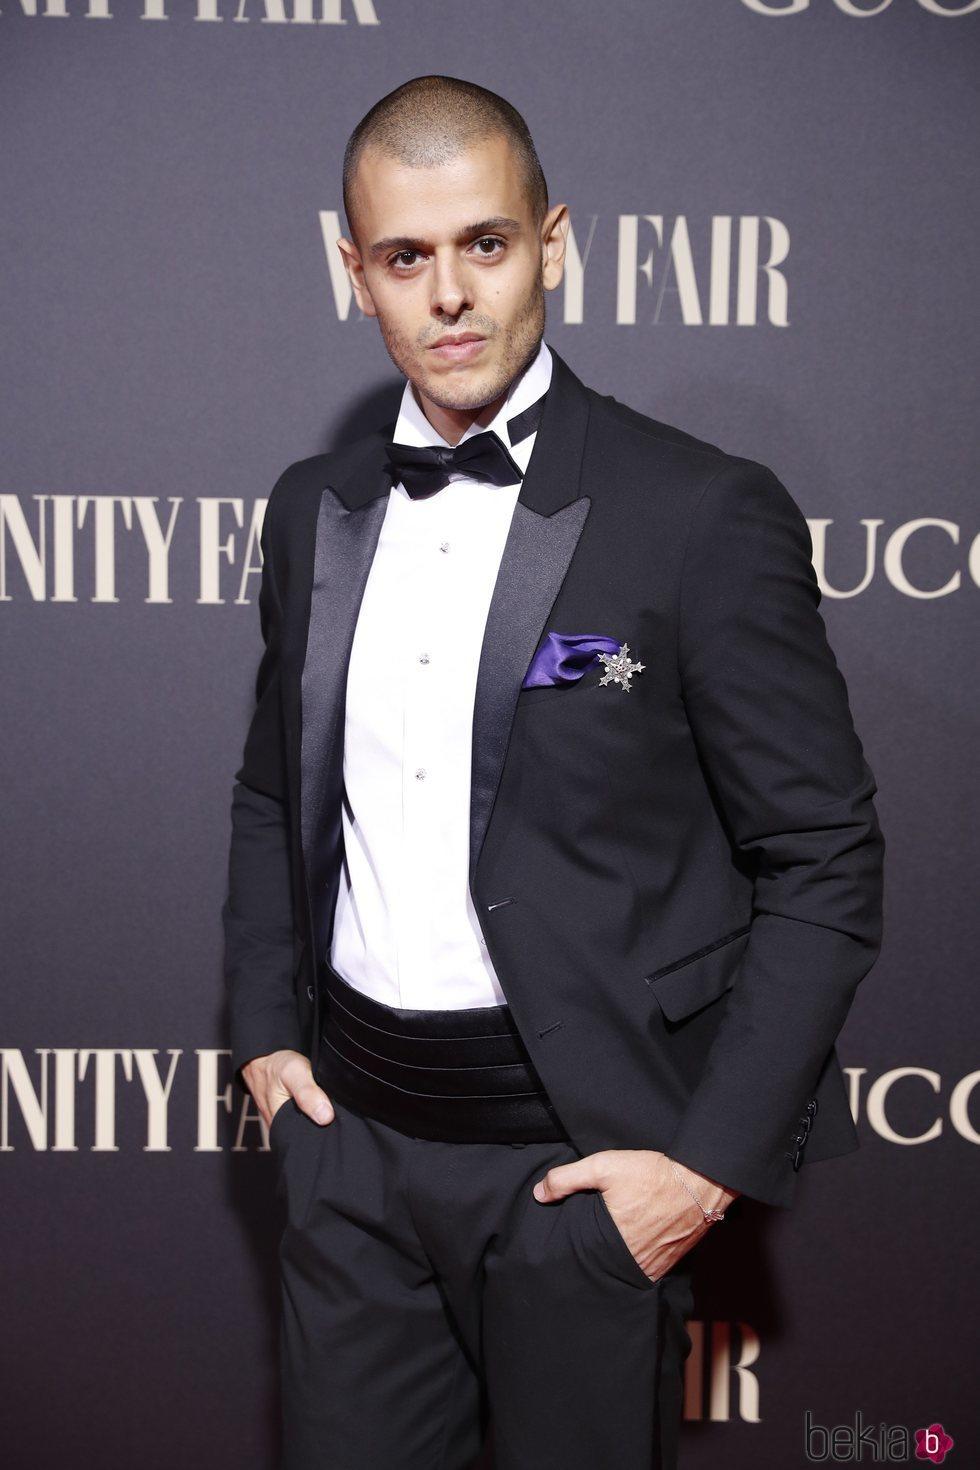 El diseñador Andrés Acosta en la alfombra de la fiesta de Vanity Fair 2018